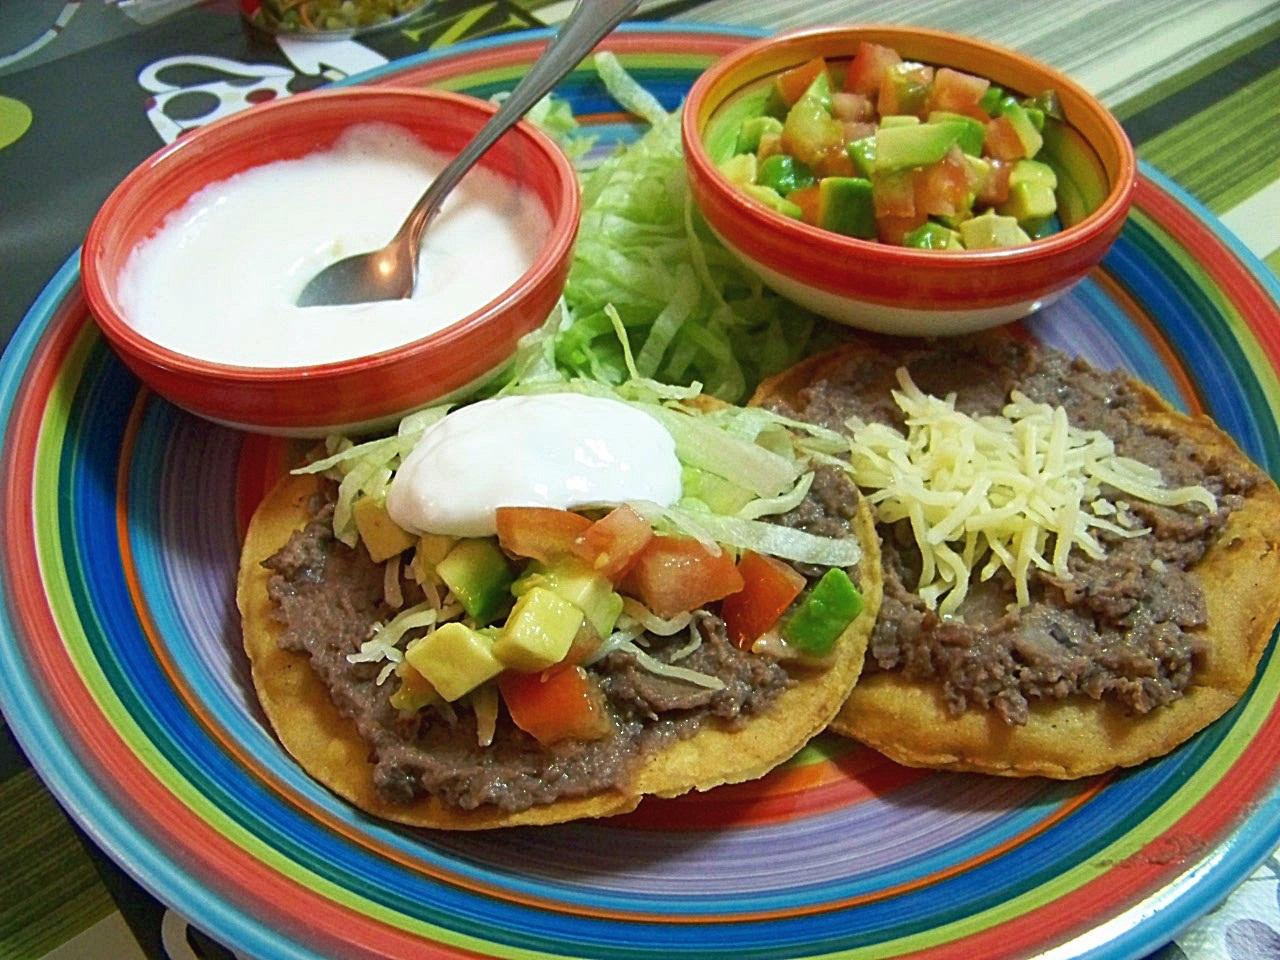 Mi Cocinita de Juguete: Tostadas Mexicanas con Frijoles ...